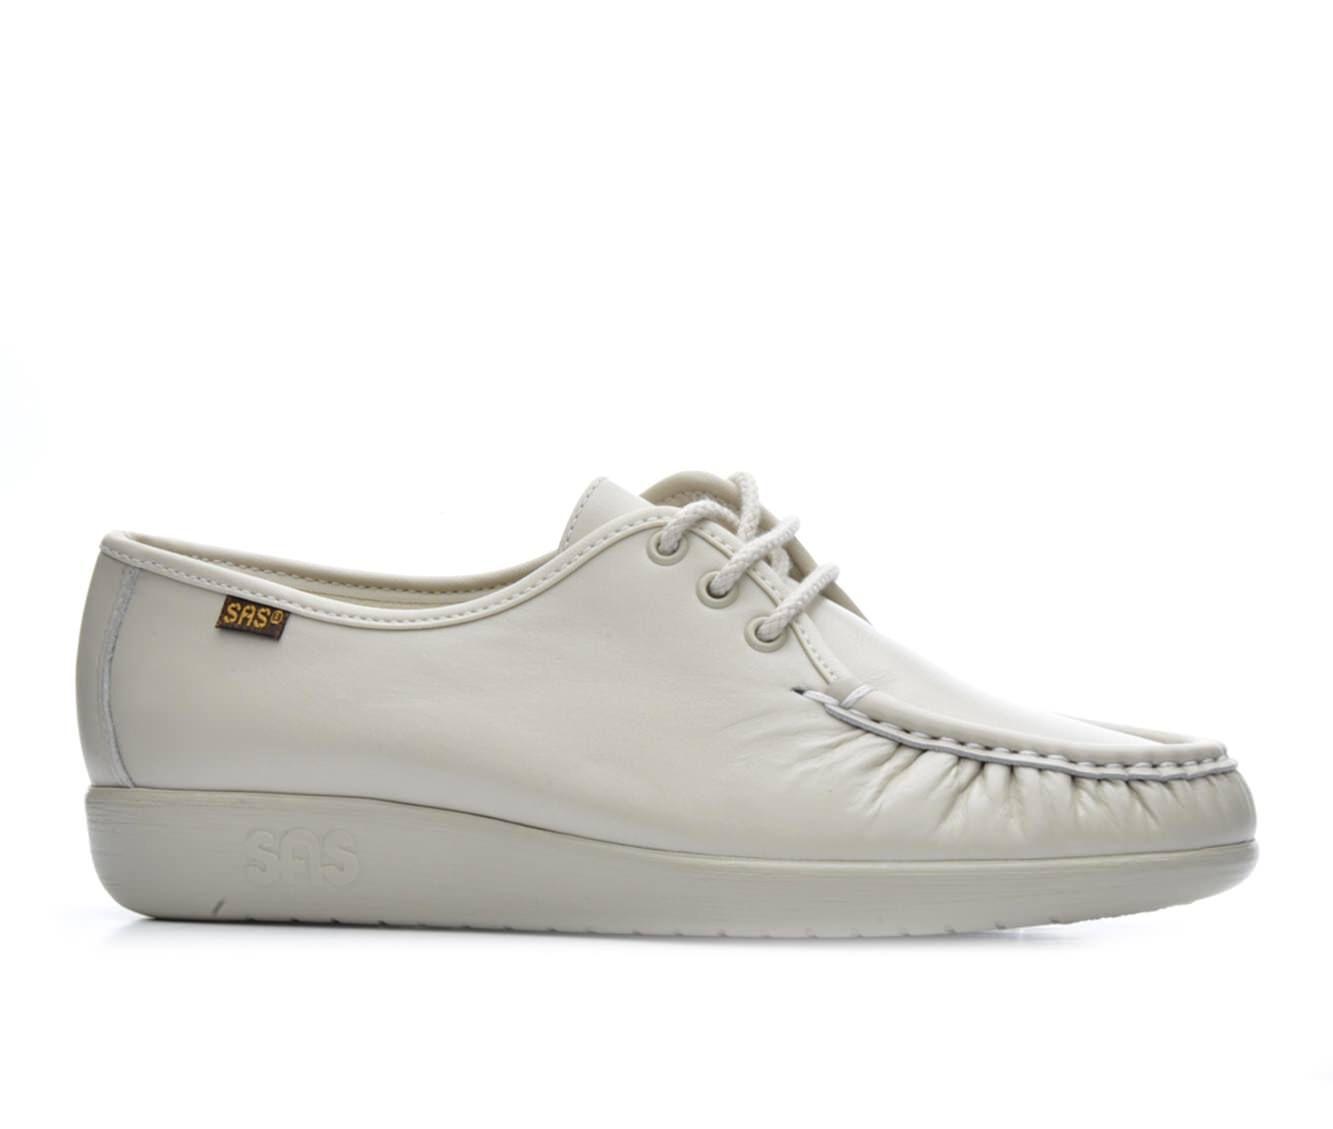 uk shoes_kd5755